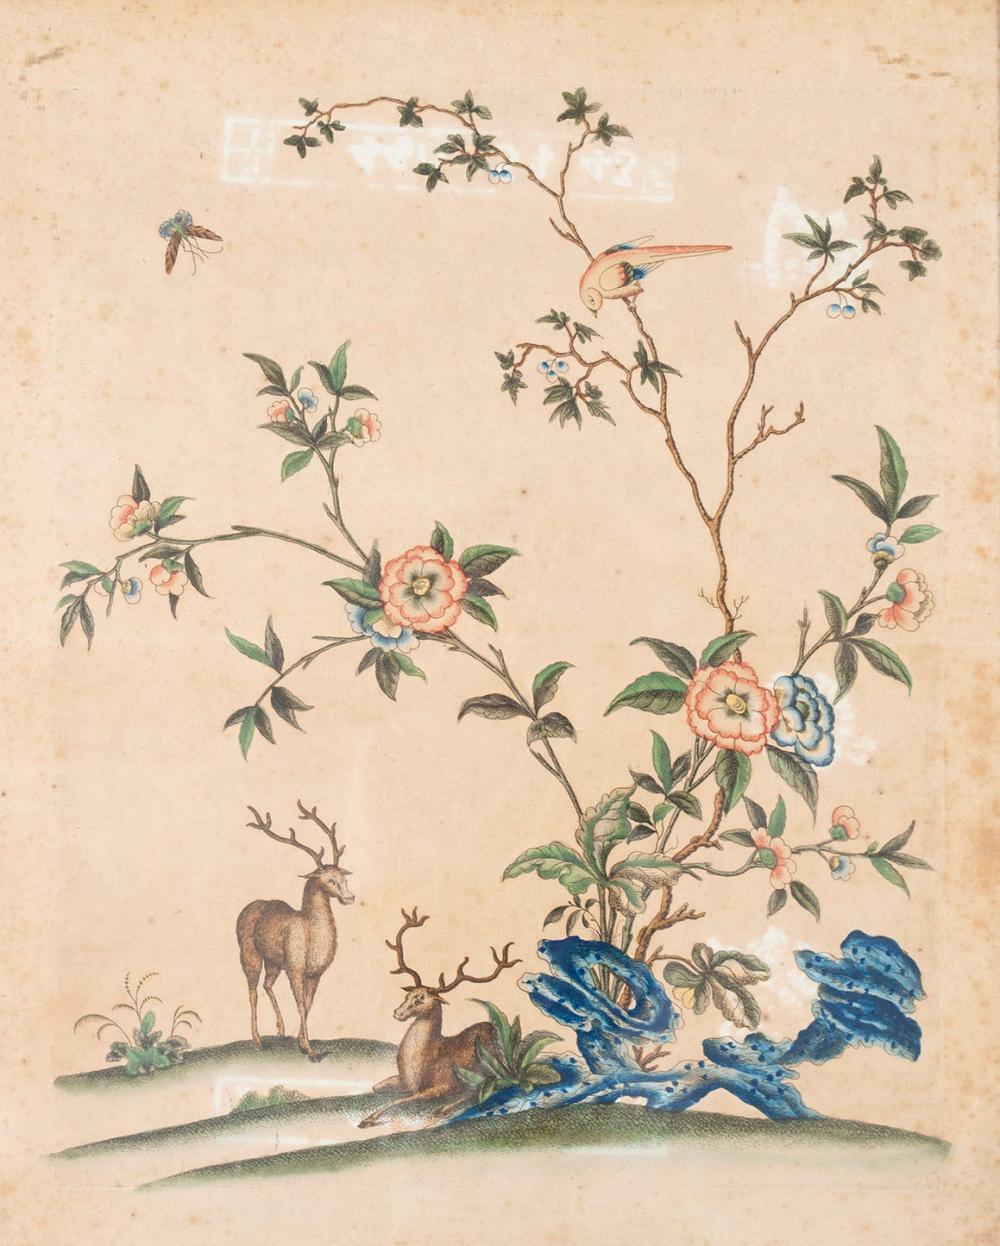 PAIRING OF 18TH CENTURY ENGRAVINGS